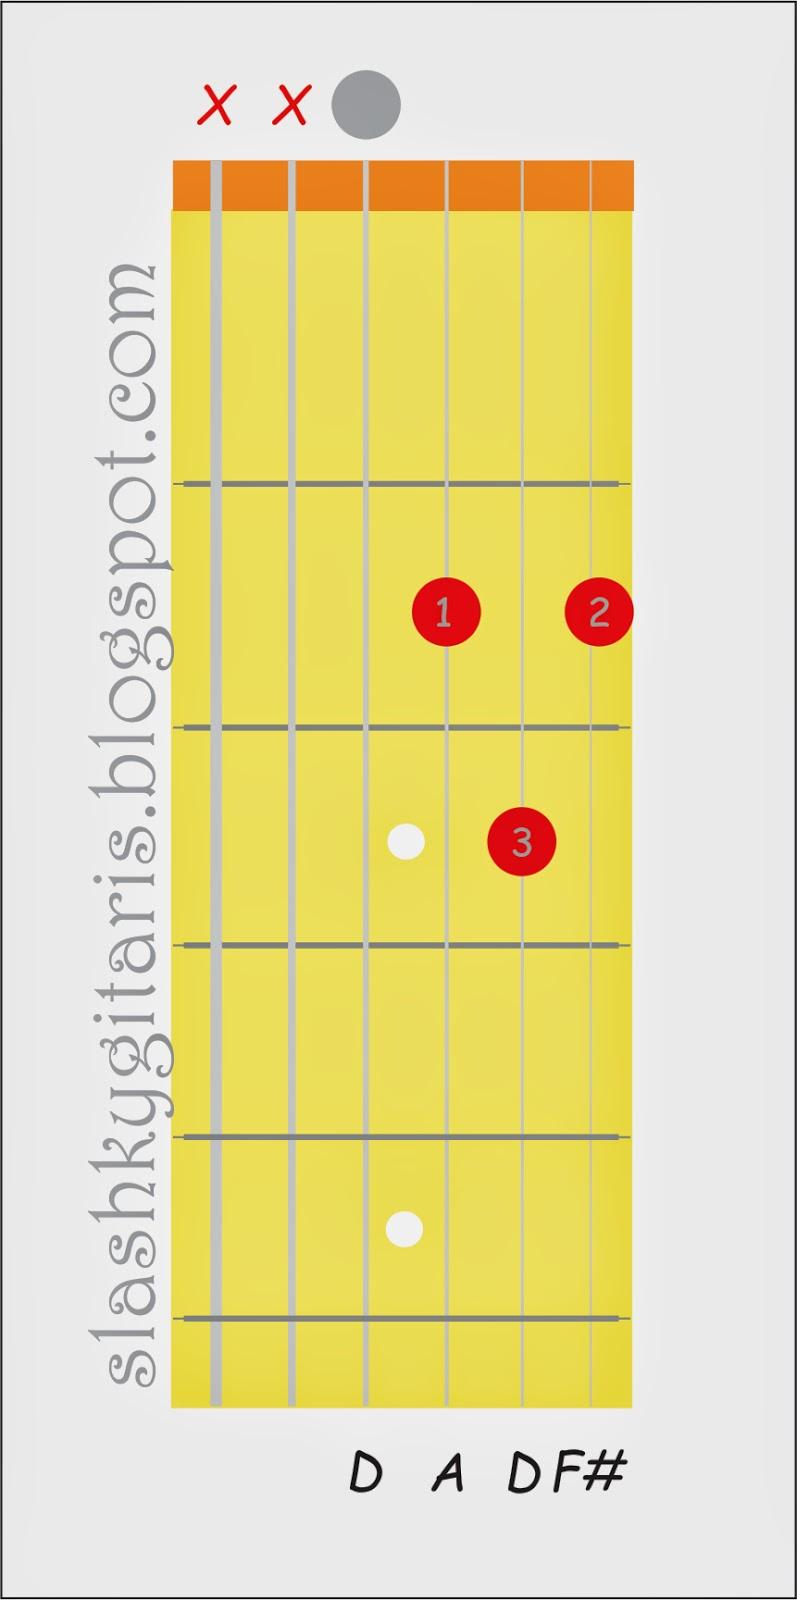 kunci gitar, chord gitar, kunci gitar peterpan, kunci gitar ungu, kunci gitar last child, kunci dasar gitar, cord gitar, gitar akustik, cara bermain gitar, kunci gitar armada, kord gitar, belajar gitar, D mayor